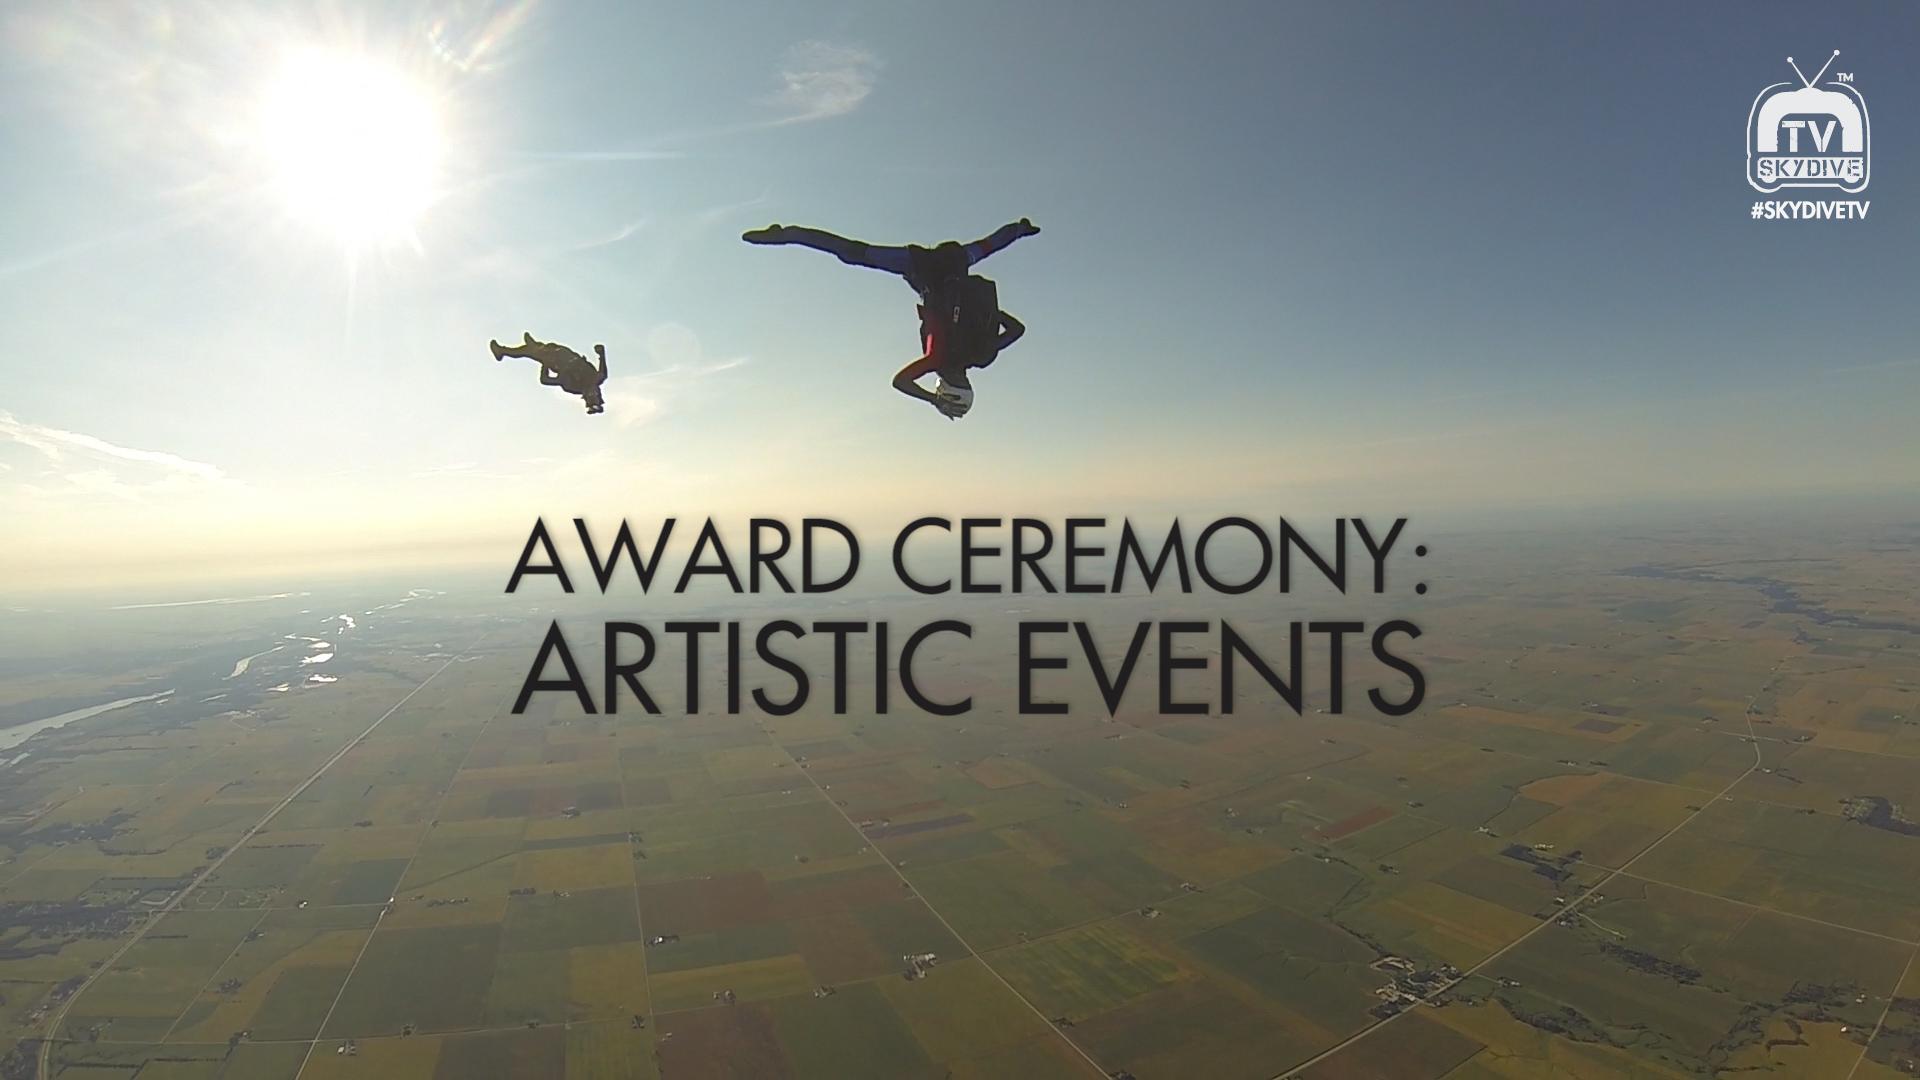 2014nationals_AWARD-CEREMONY-Artistic